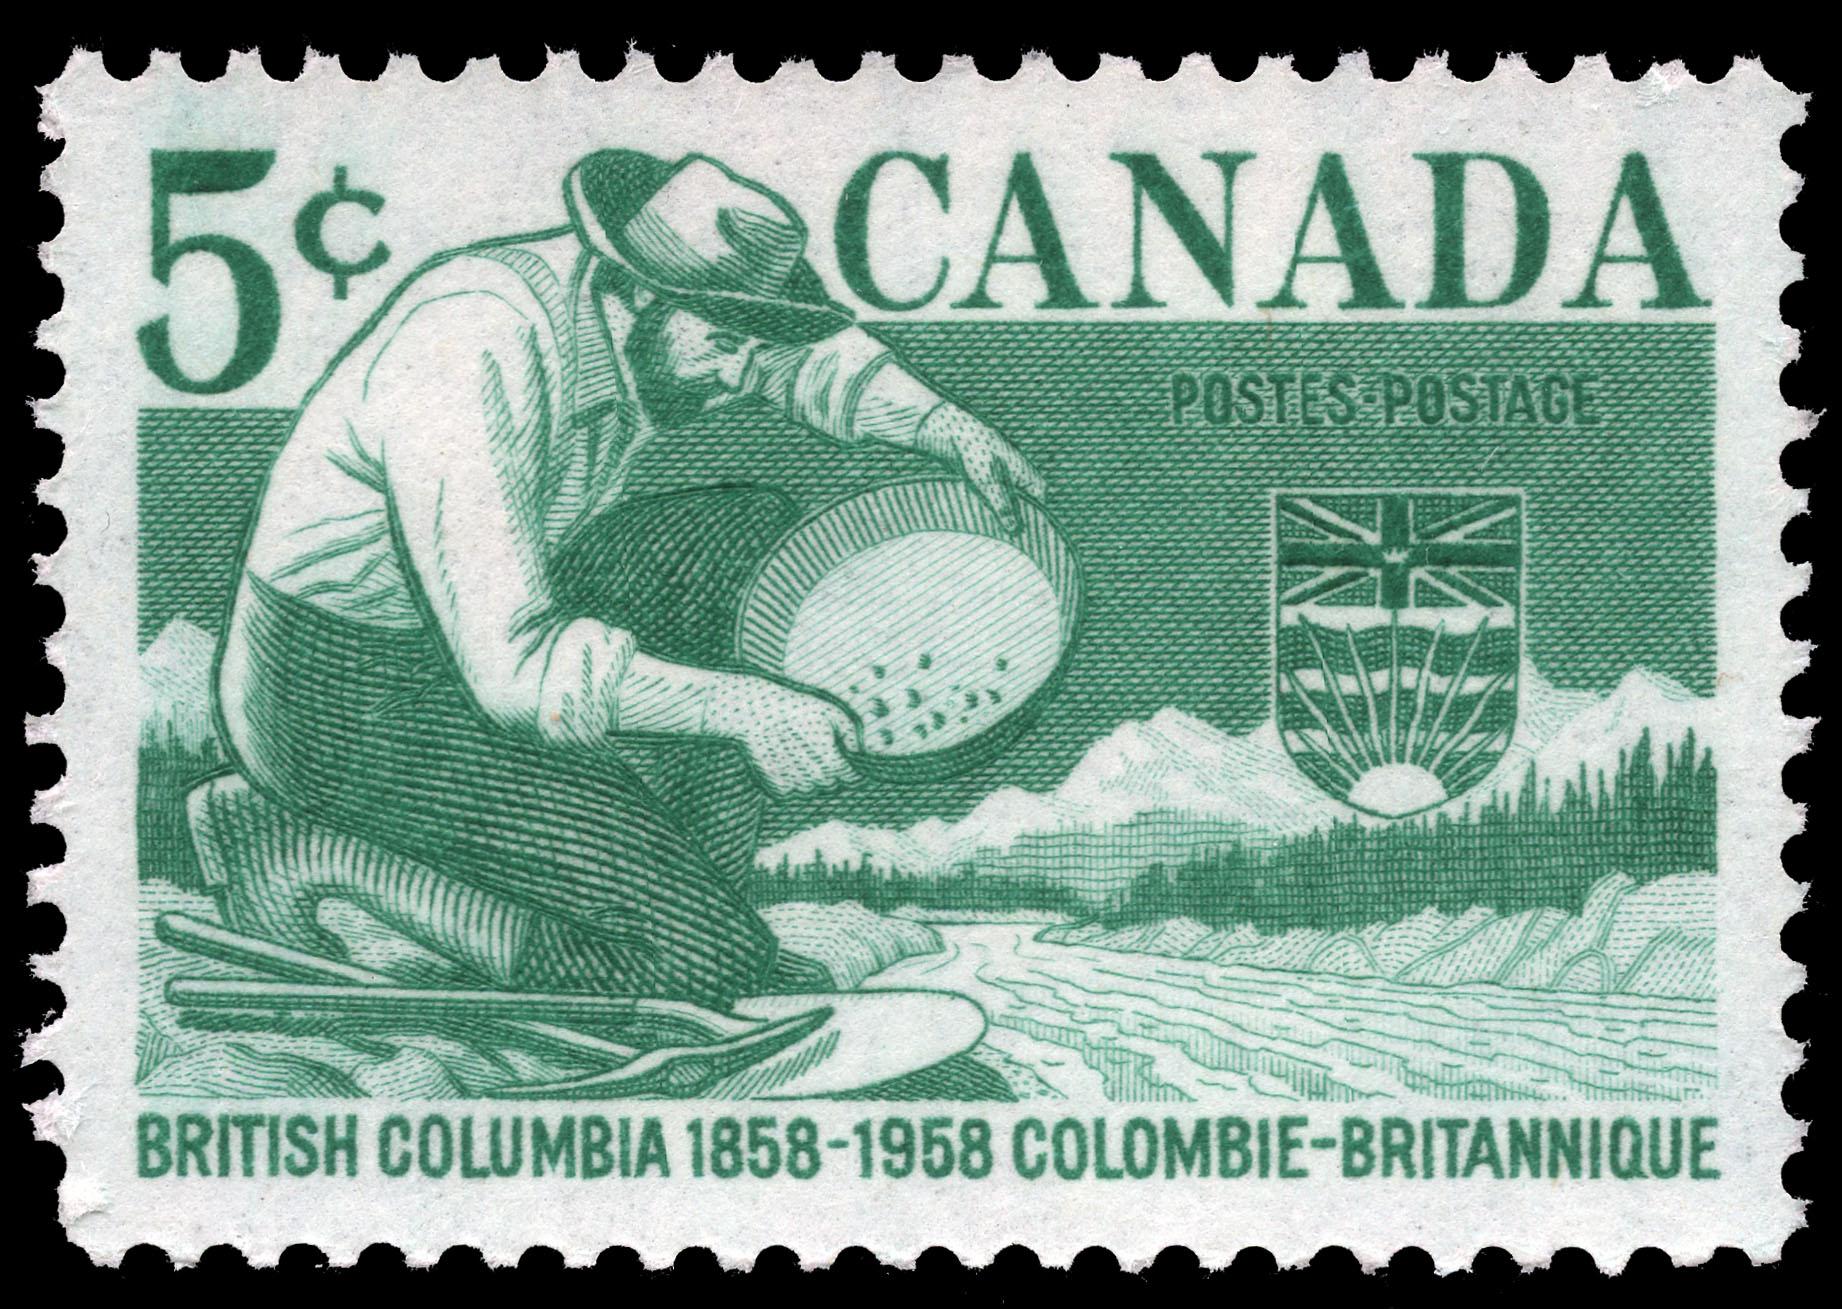 British Columbia, 1858-1958 Canada Postage Stamp